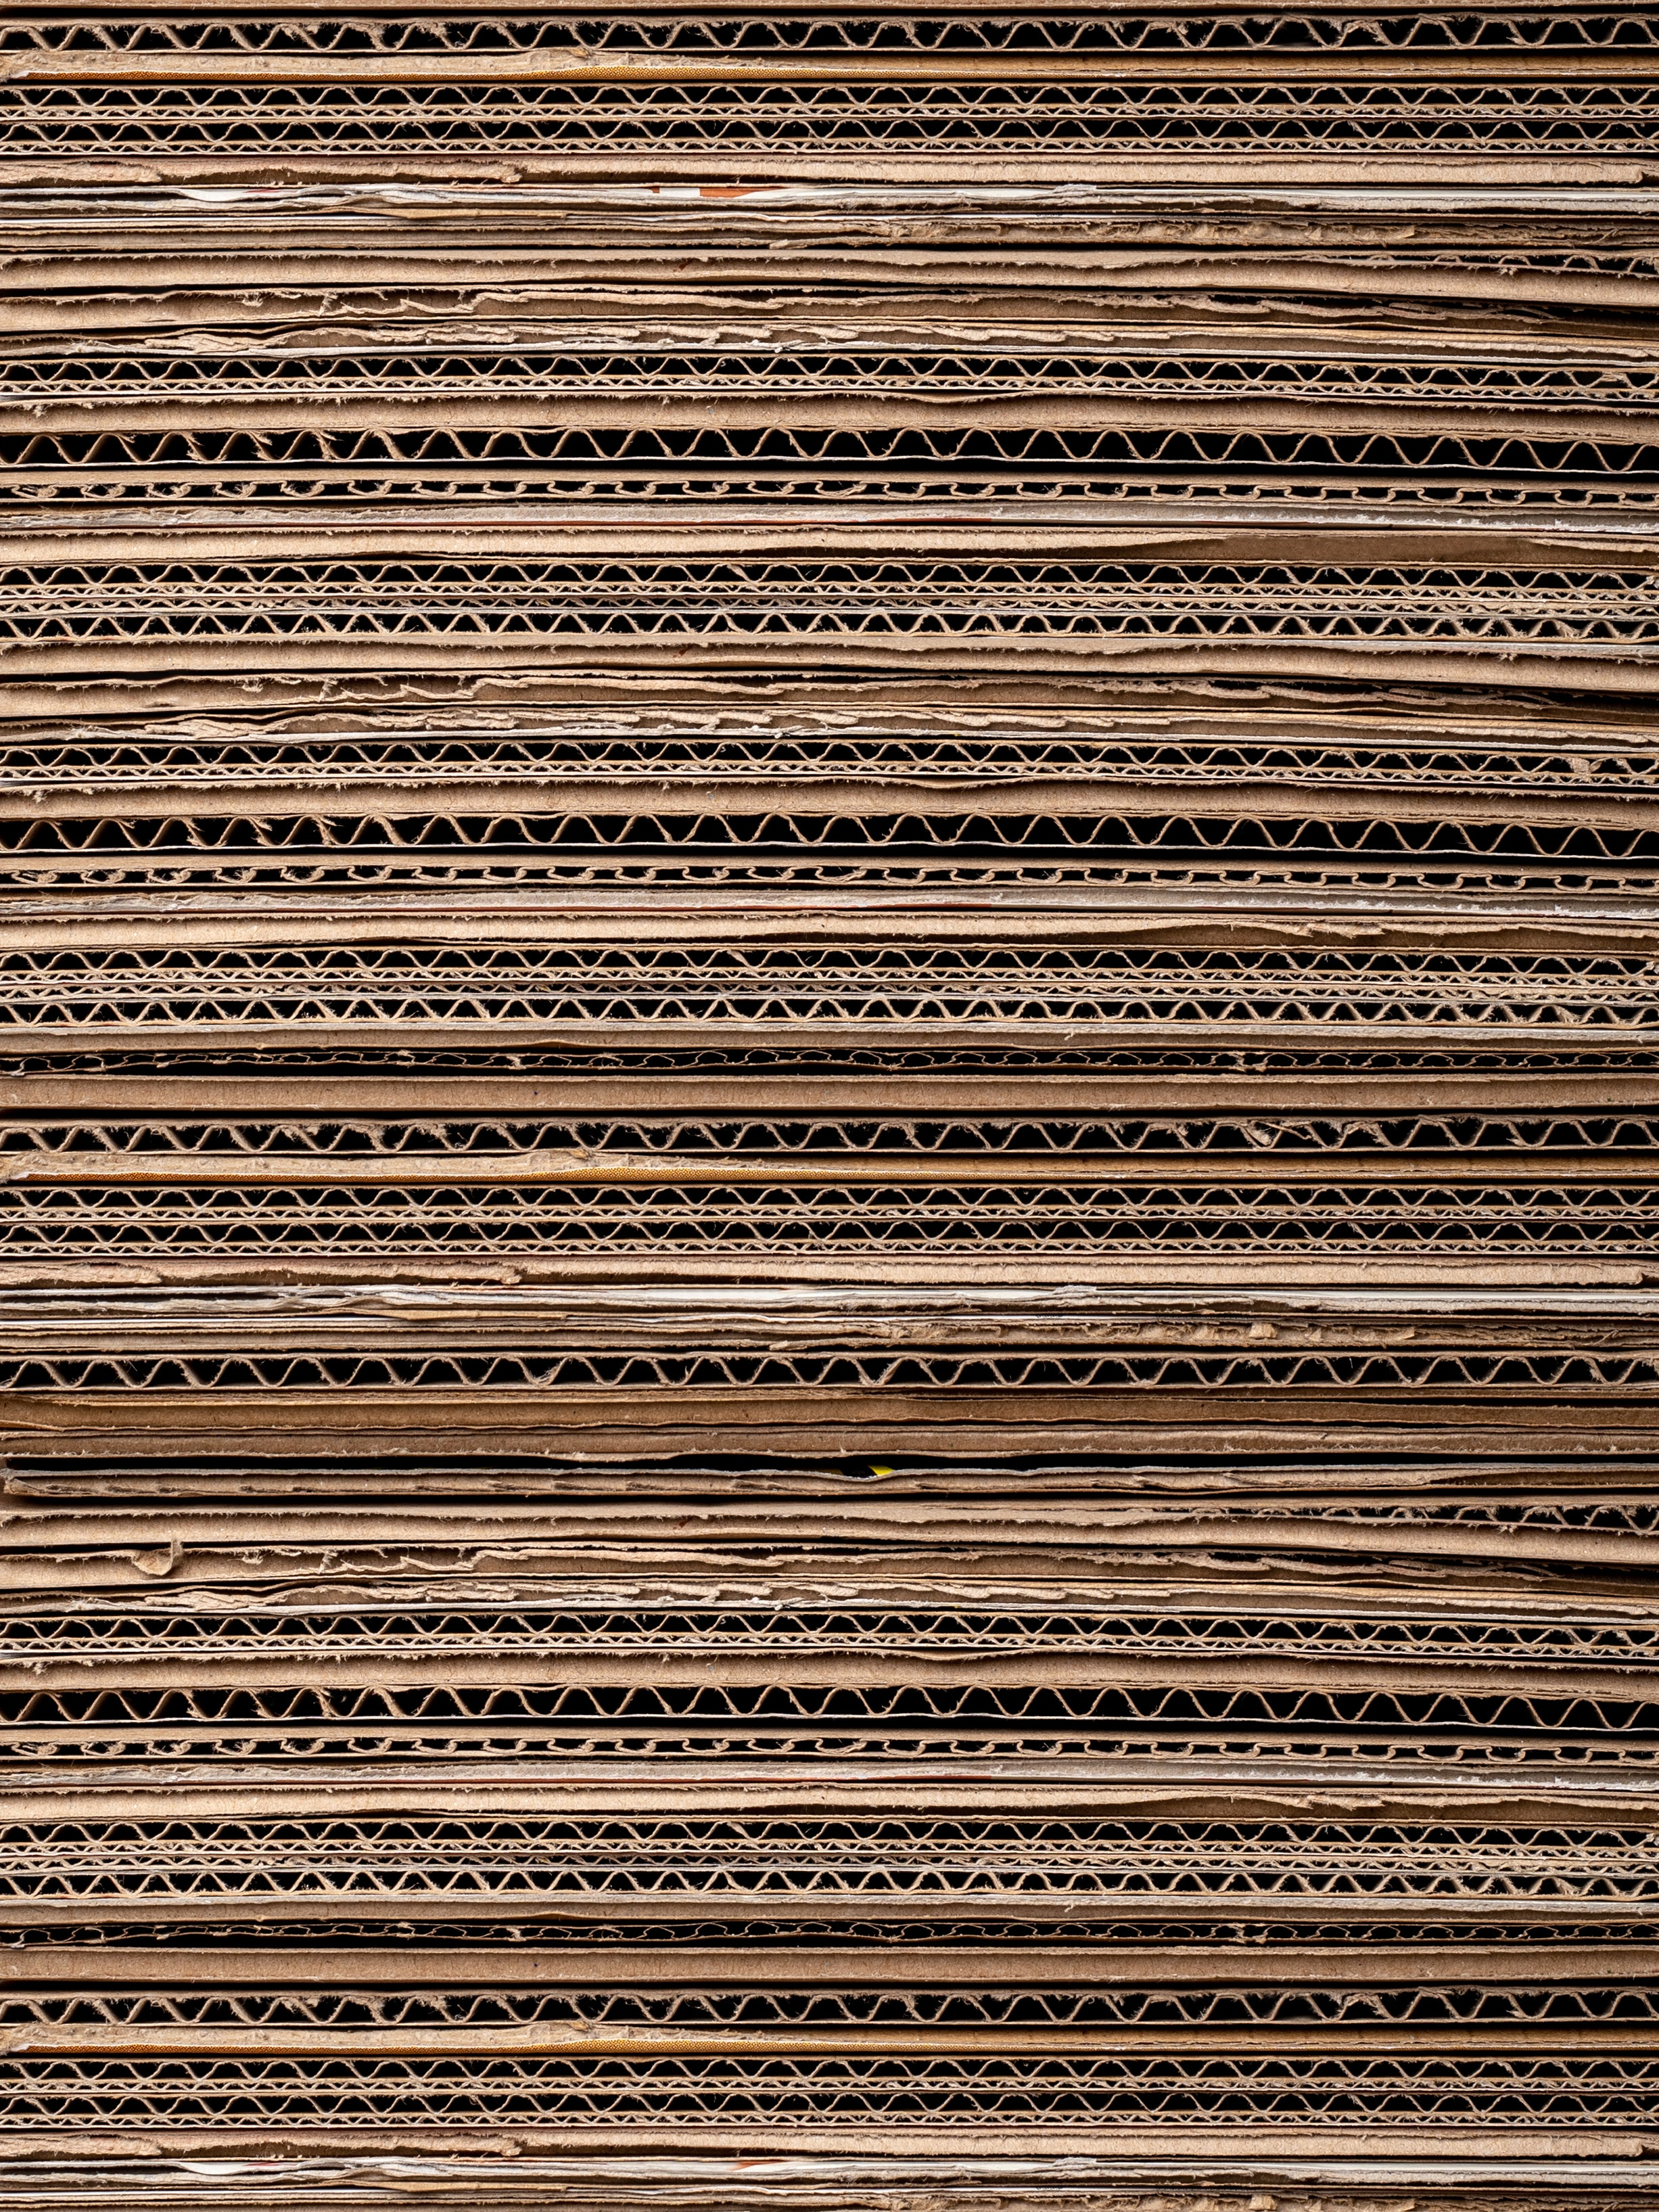 brown-cardboard-close-up-1555199